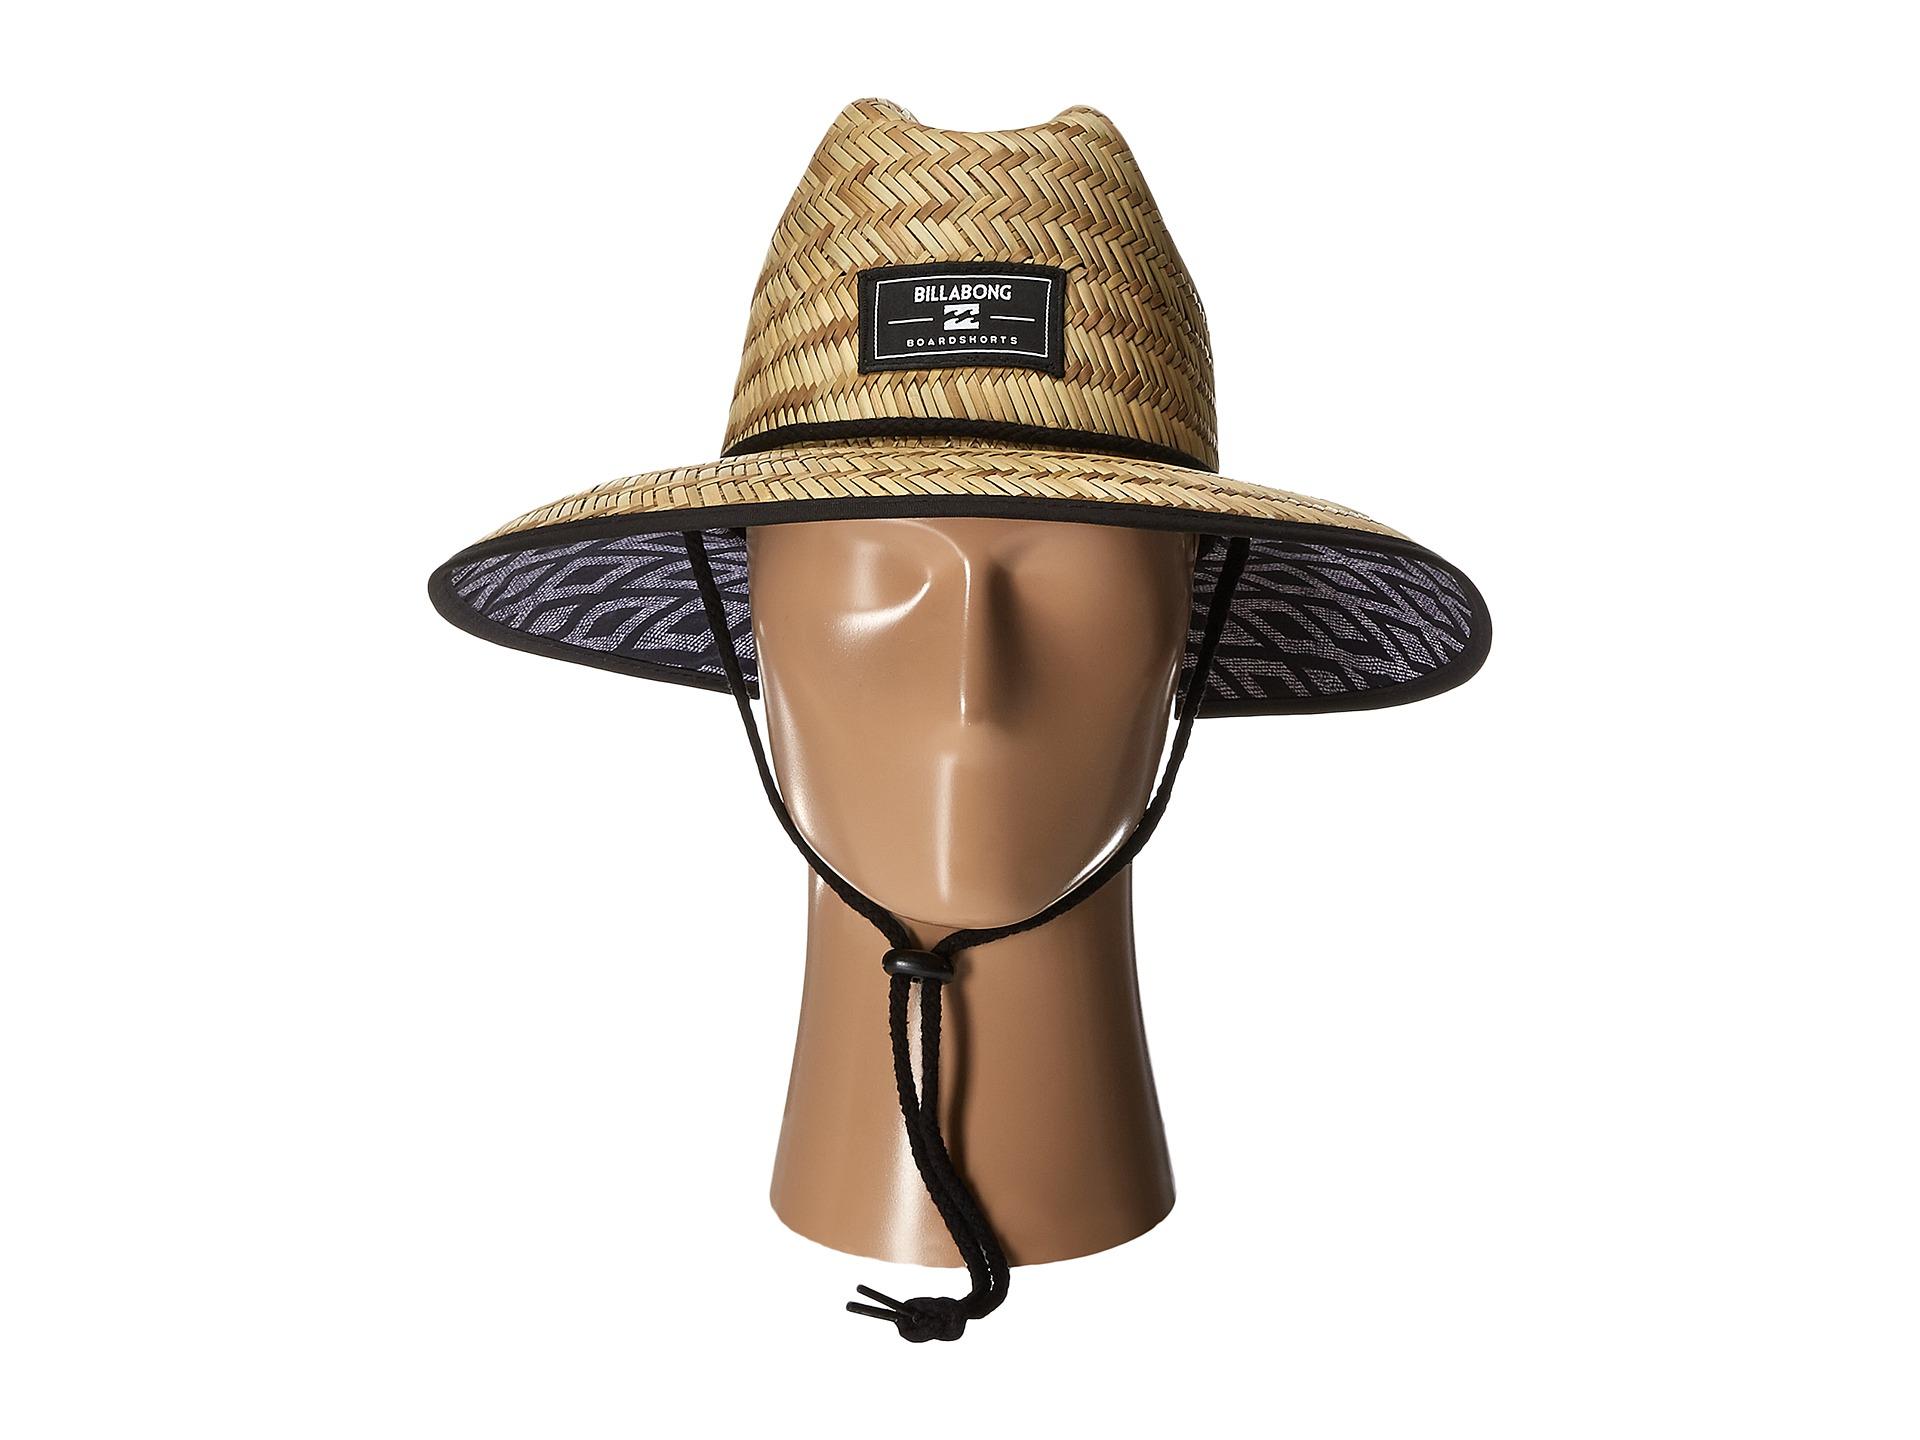 89cf005e949c2 ... czech walled trucker hat black lyst billabong brolock hat in natural  for men 6be49 edd52